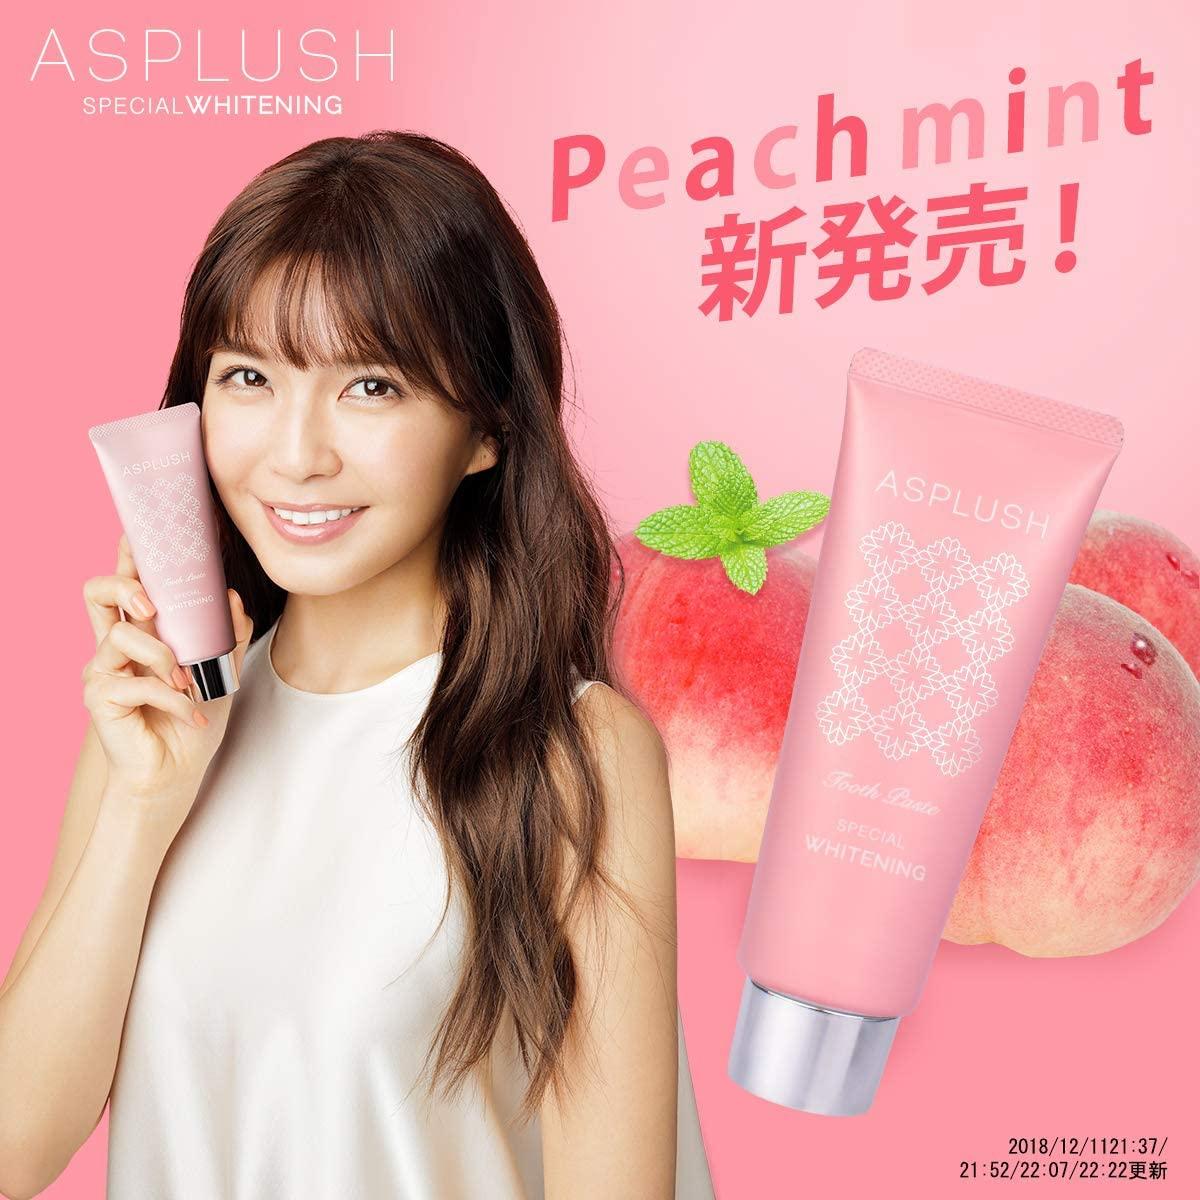 ASPLUSH(アスプラッシュ)ホワイトニング 歯磨き粉の商品画像6